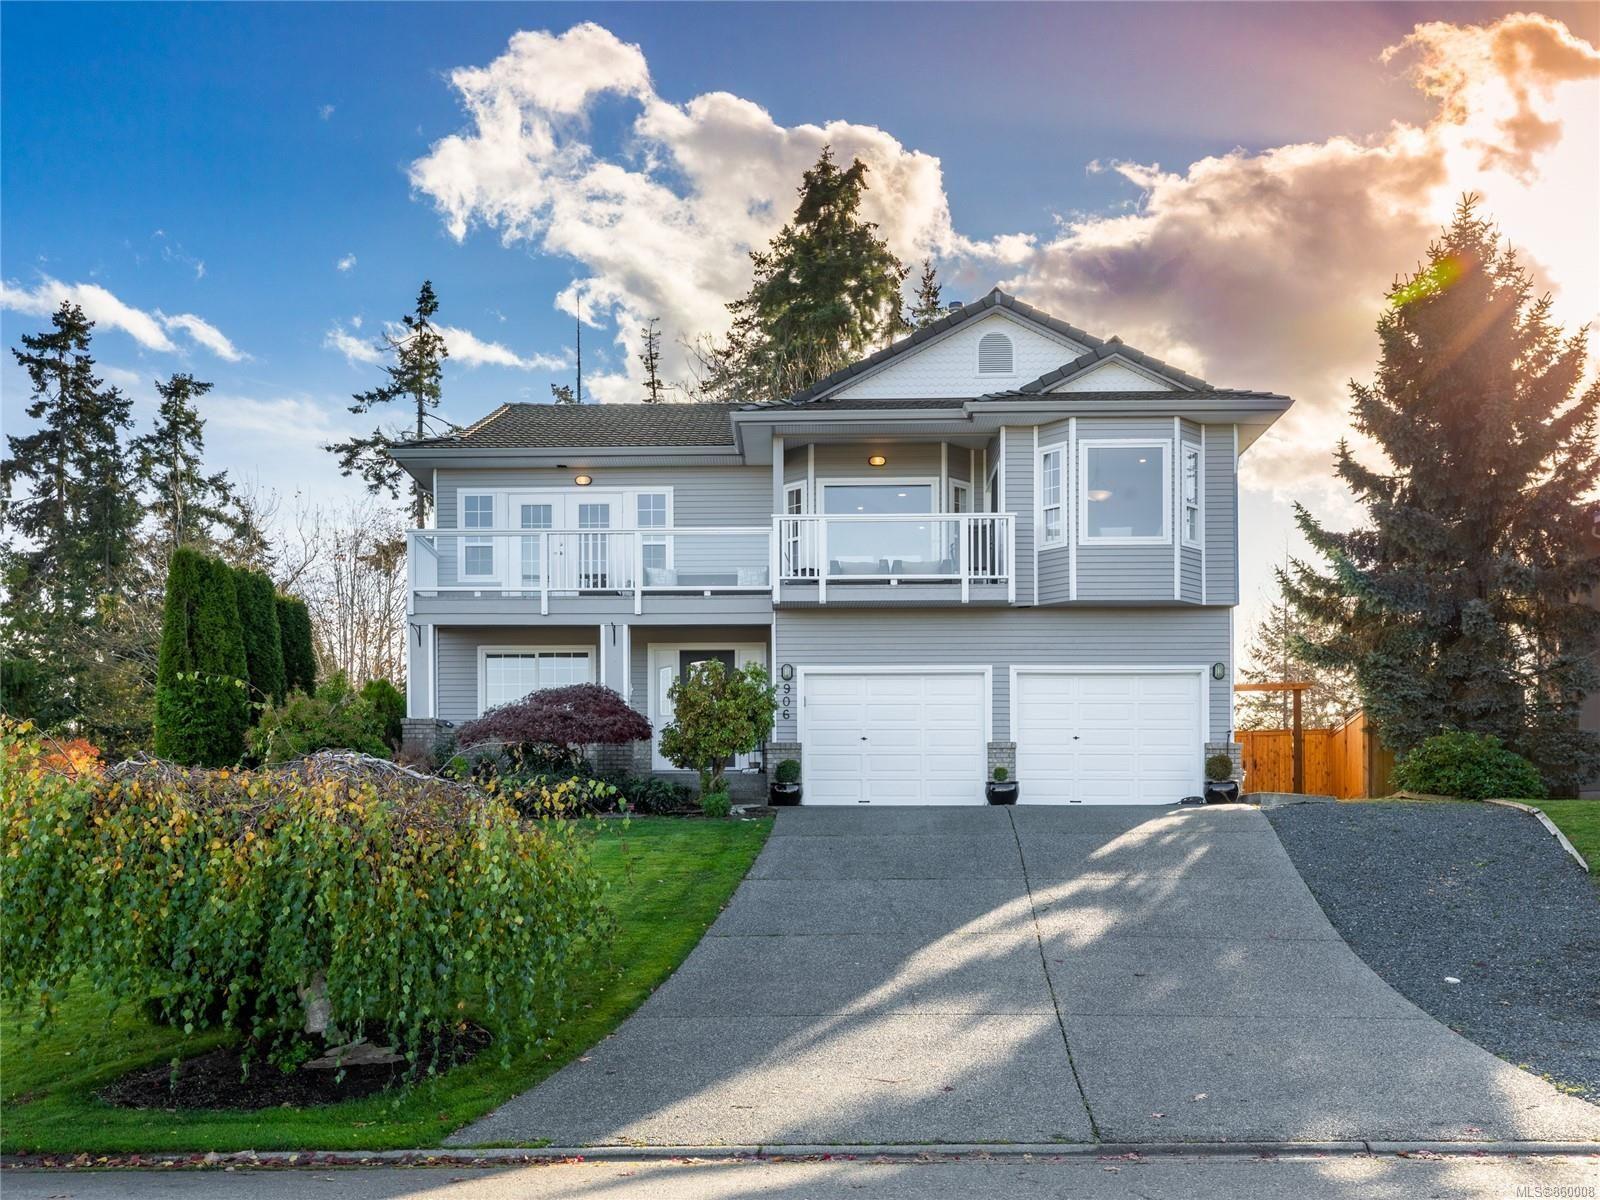 Main Photo: 906 Fairways Dr in : PQ Qualicum Beach House for sale (Parksville/Qualicum)  : MLS®# 860008